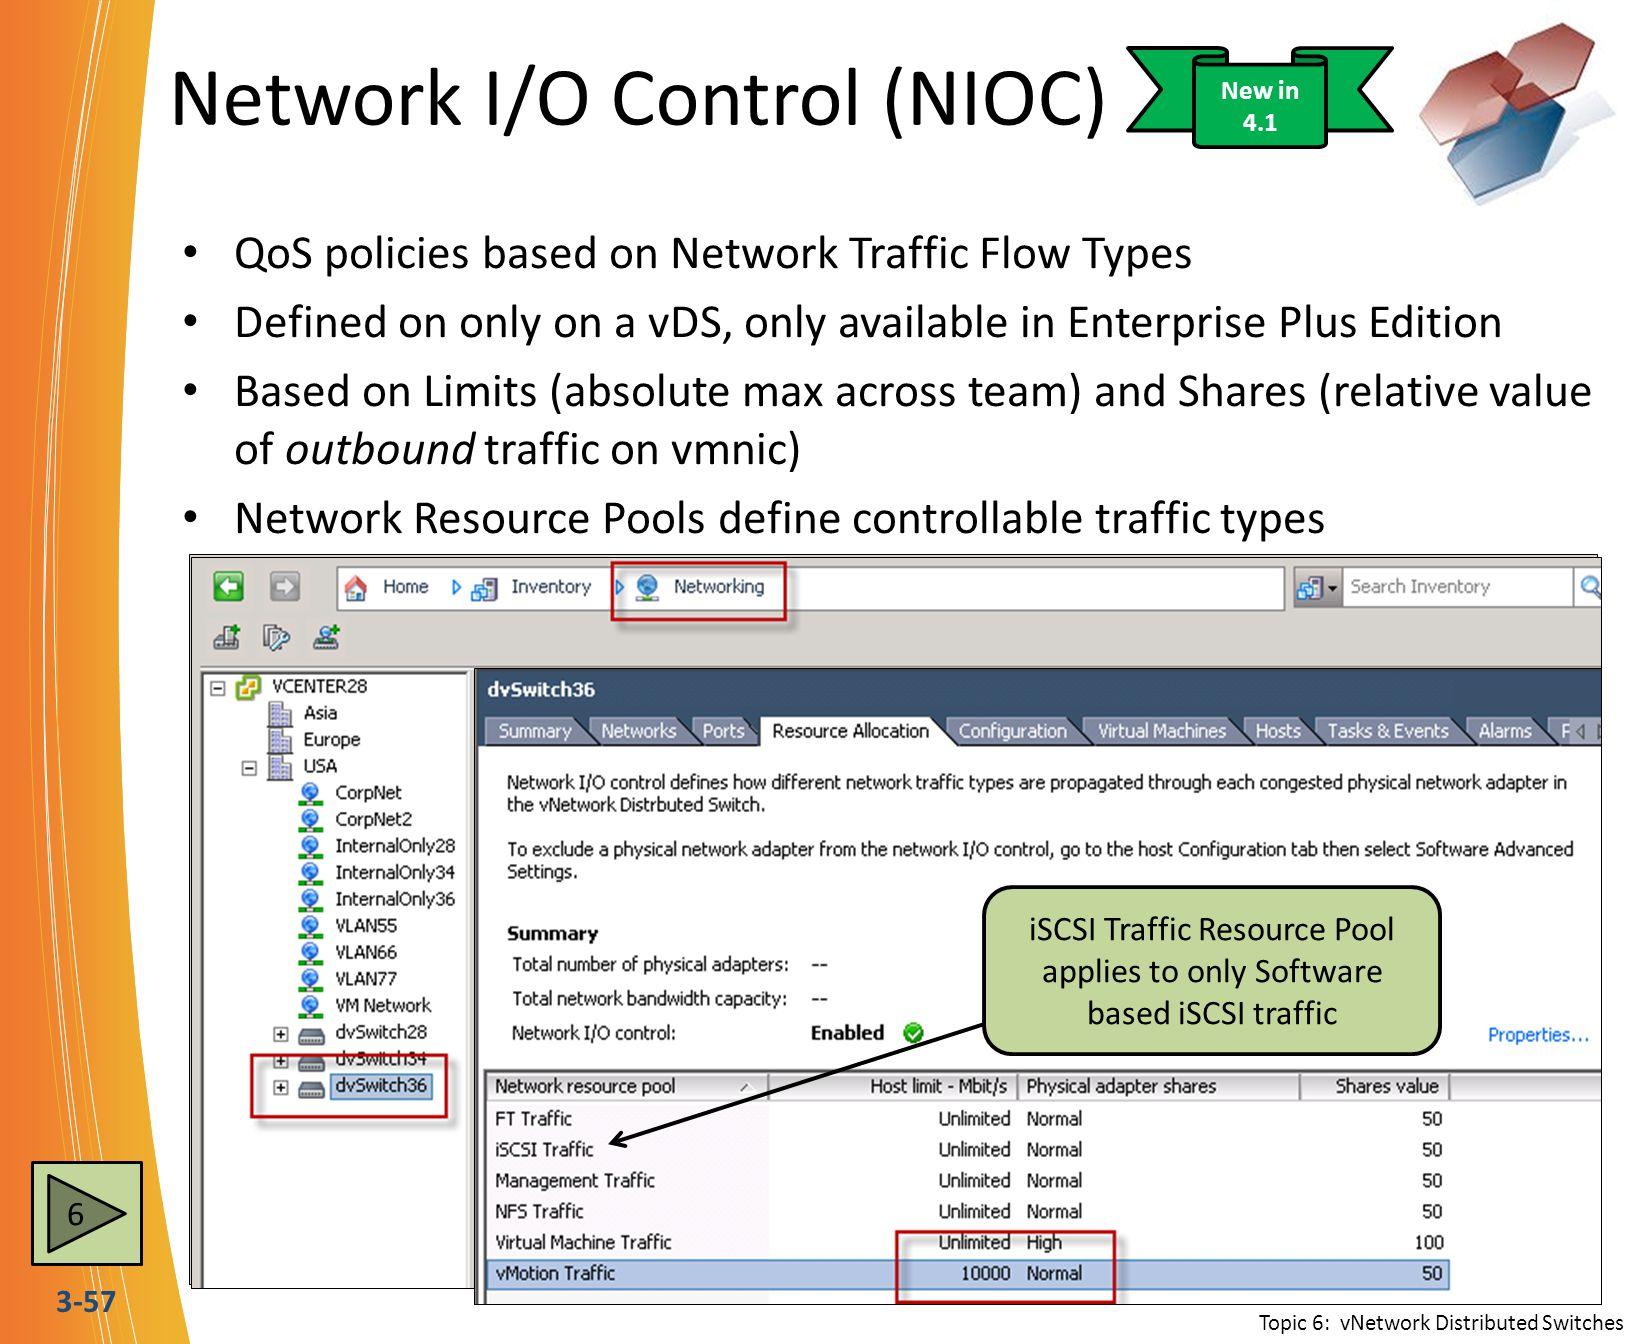 Network I/O Control (NIOC)